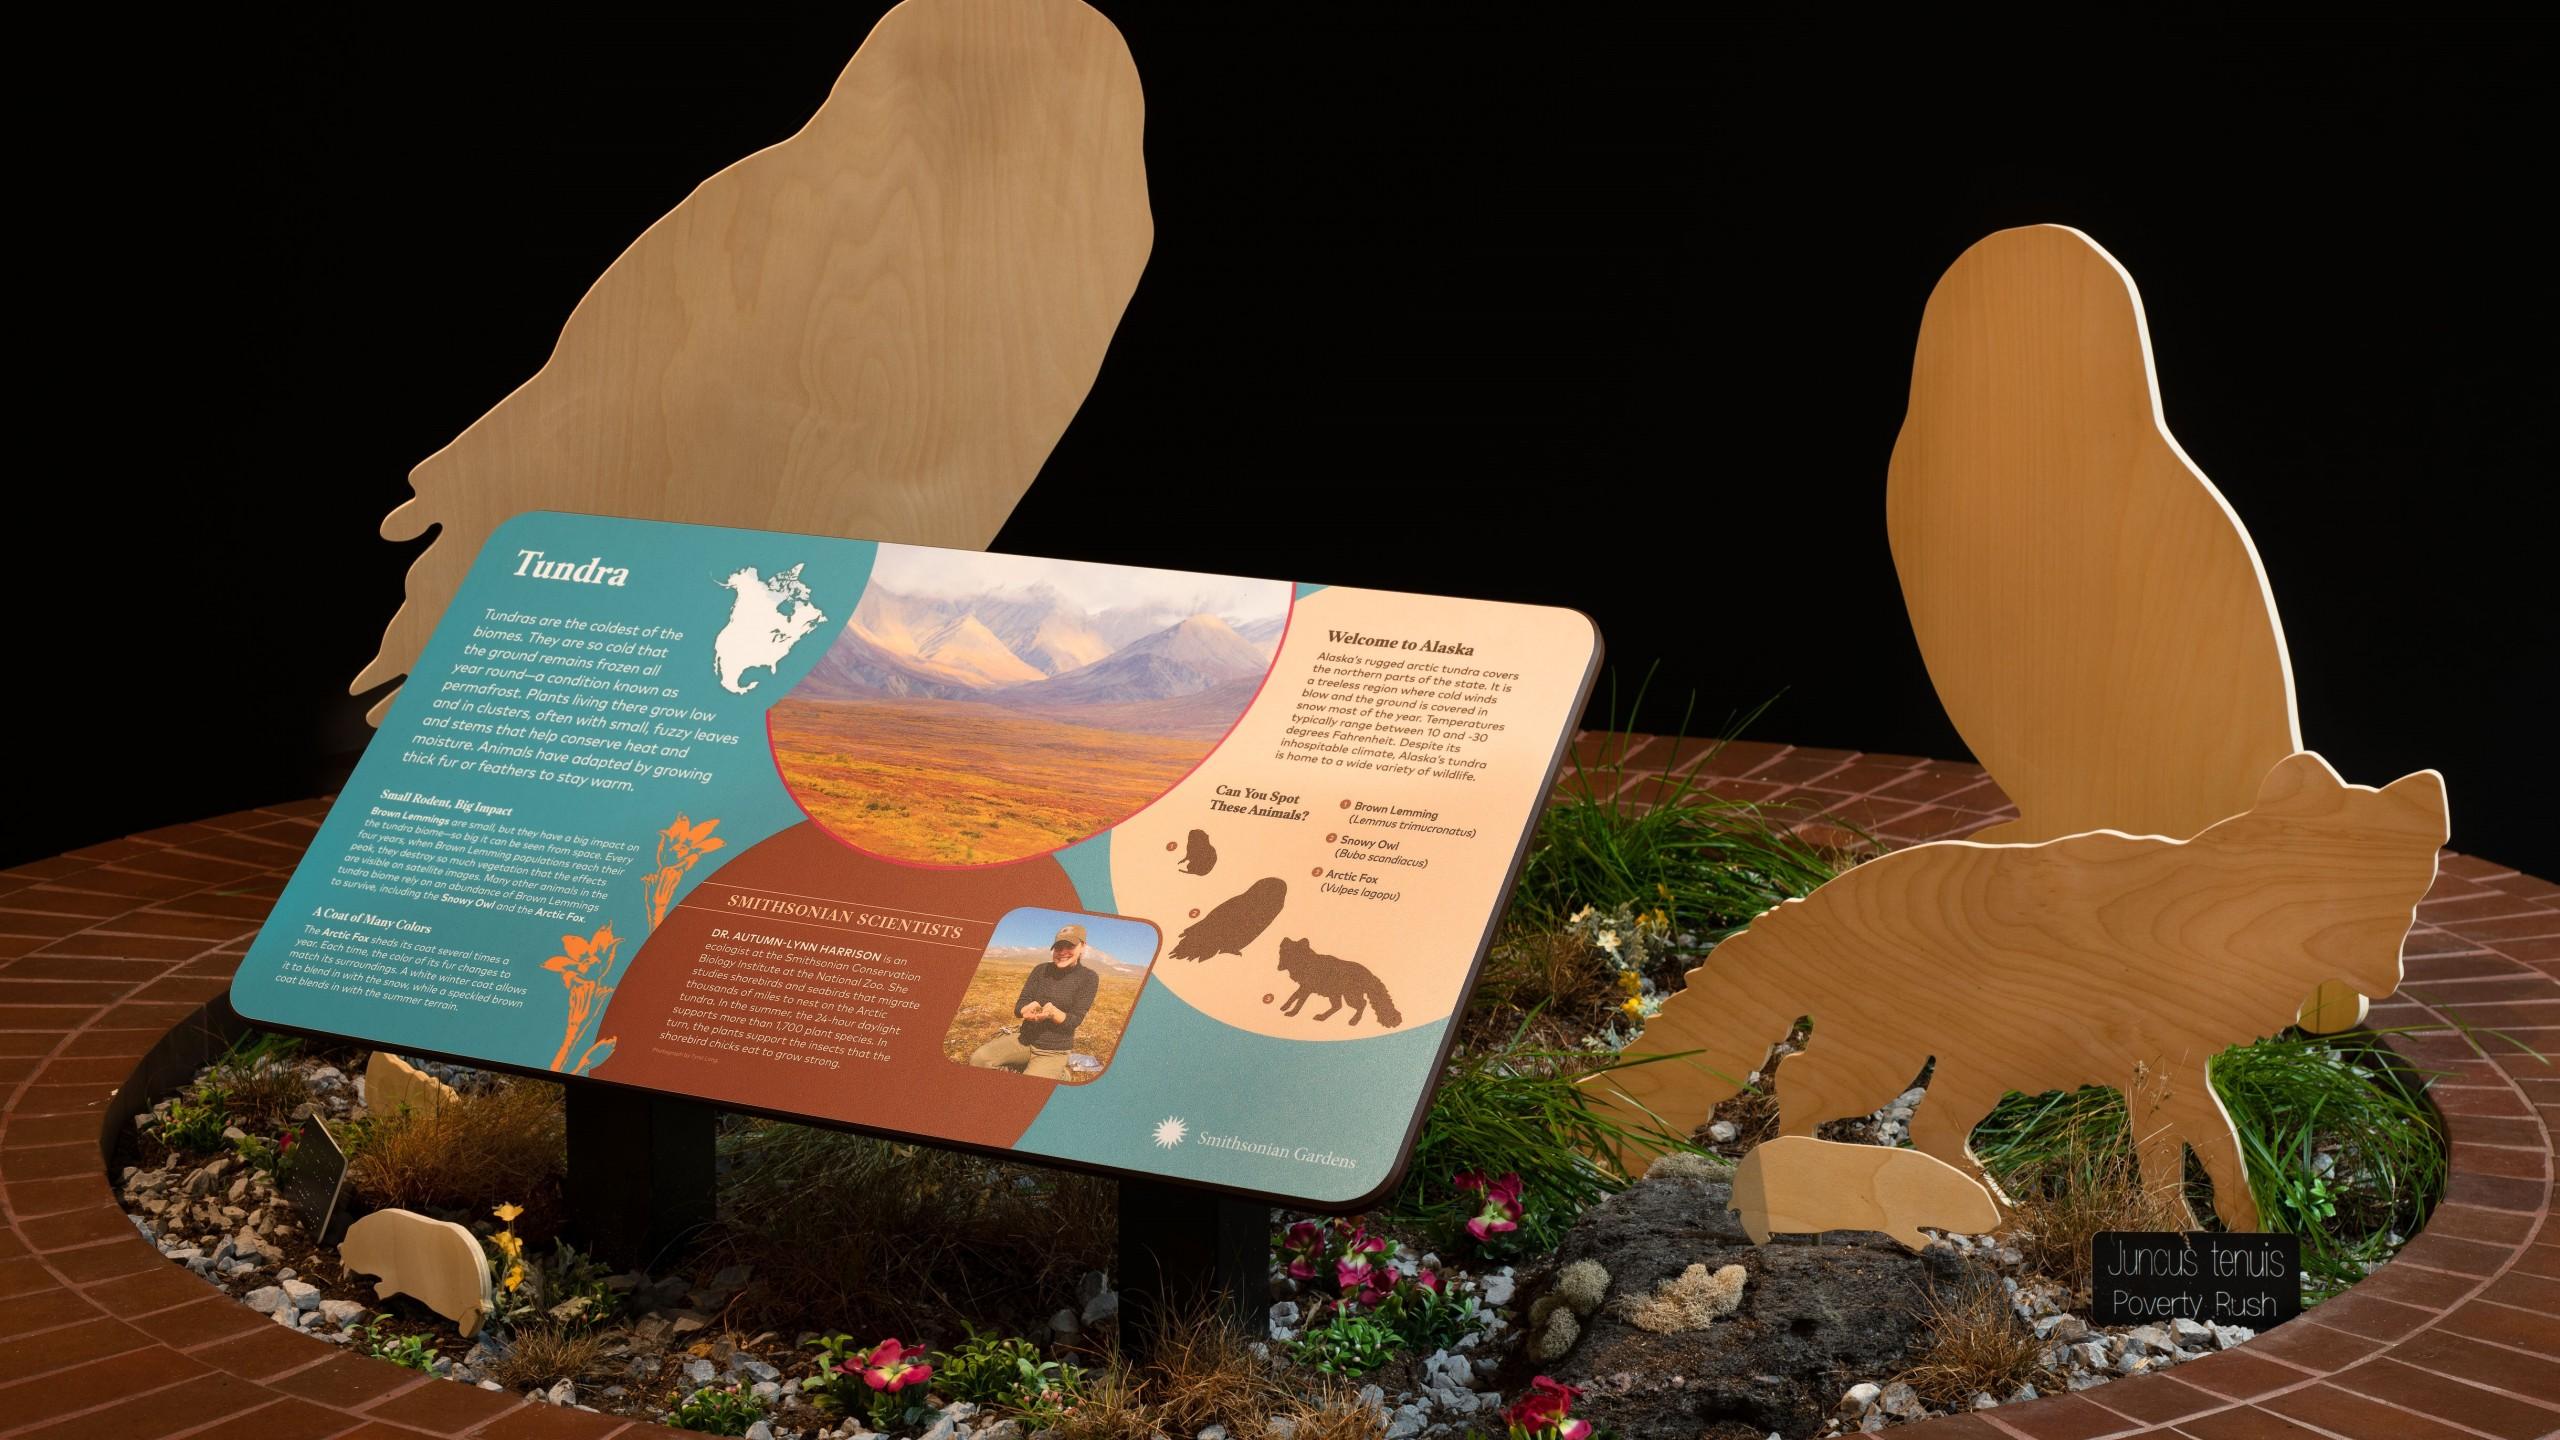 Biomes: Life in Balance inside the S. Dillon Ripley Center, Habitat Exhibition. Carolyn Thome, photographer.